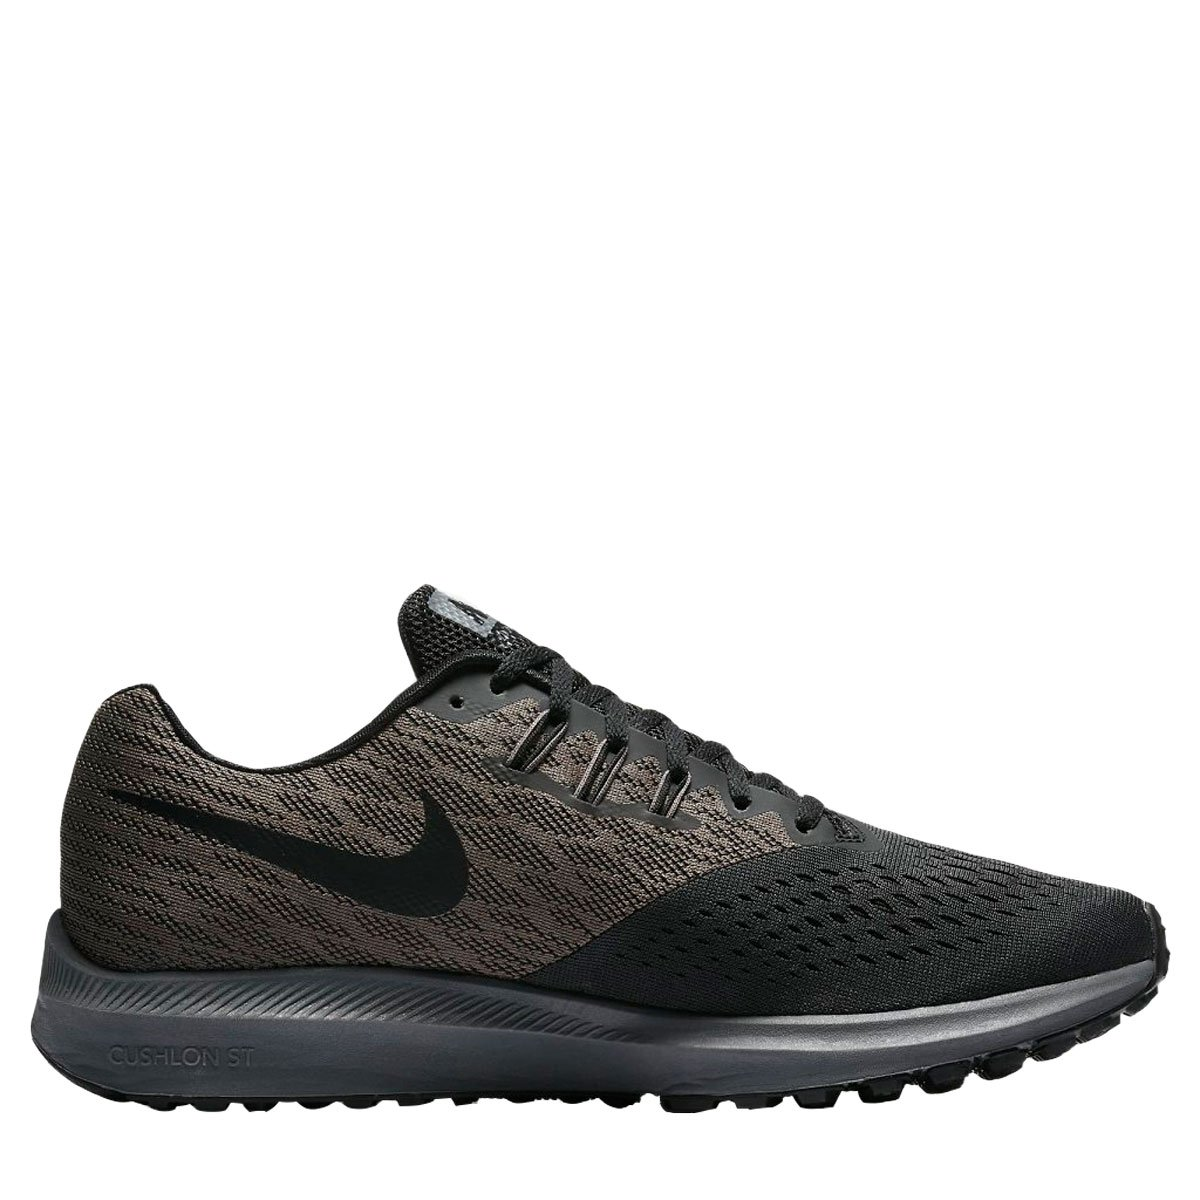 a87adc8bd65 Bizz Store - Tênis Masculino Nike Zoom Winflo 4 Corrida Preto